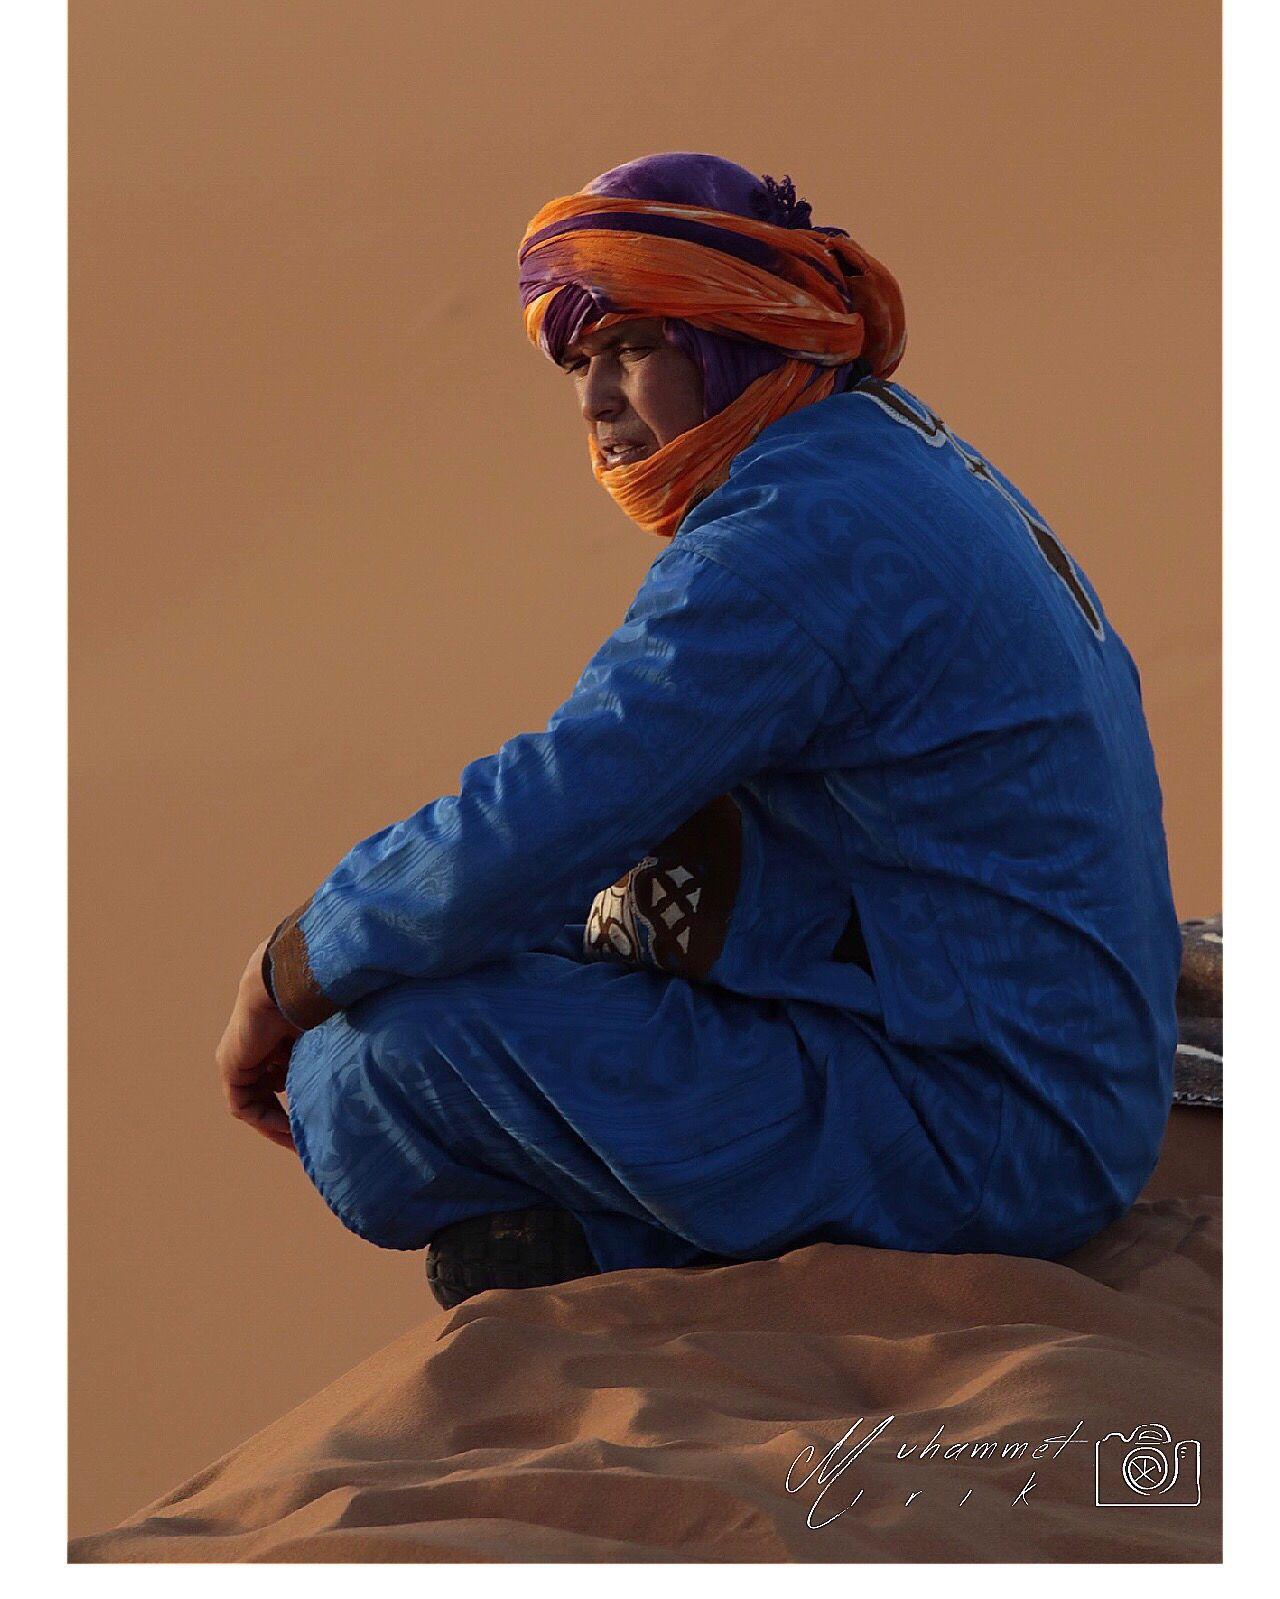 Maroc Marocco Maroc ❤️ Morocco Sahara Sahara Desert Saharadesert Desert Desert Beauty Desert Life Lifestyles Life Man Portrait First Eyeem Photo EyeEm Best Shots EyeEm Nature Lover EyeEm Gallery EyeEm EyeEm Best Edits EyeEmBestPics Taking Photos Taking Pictures Gallery Photo